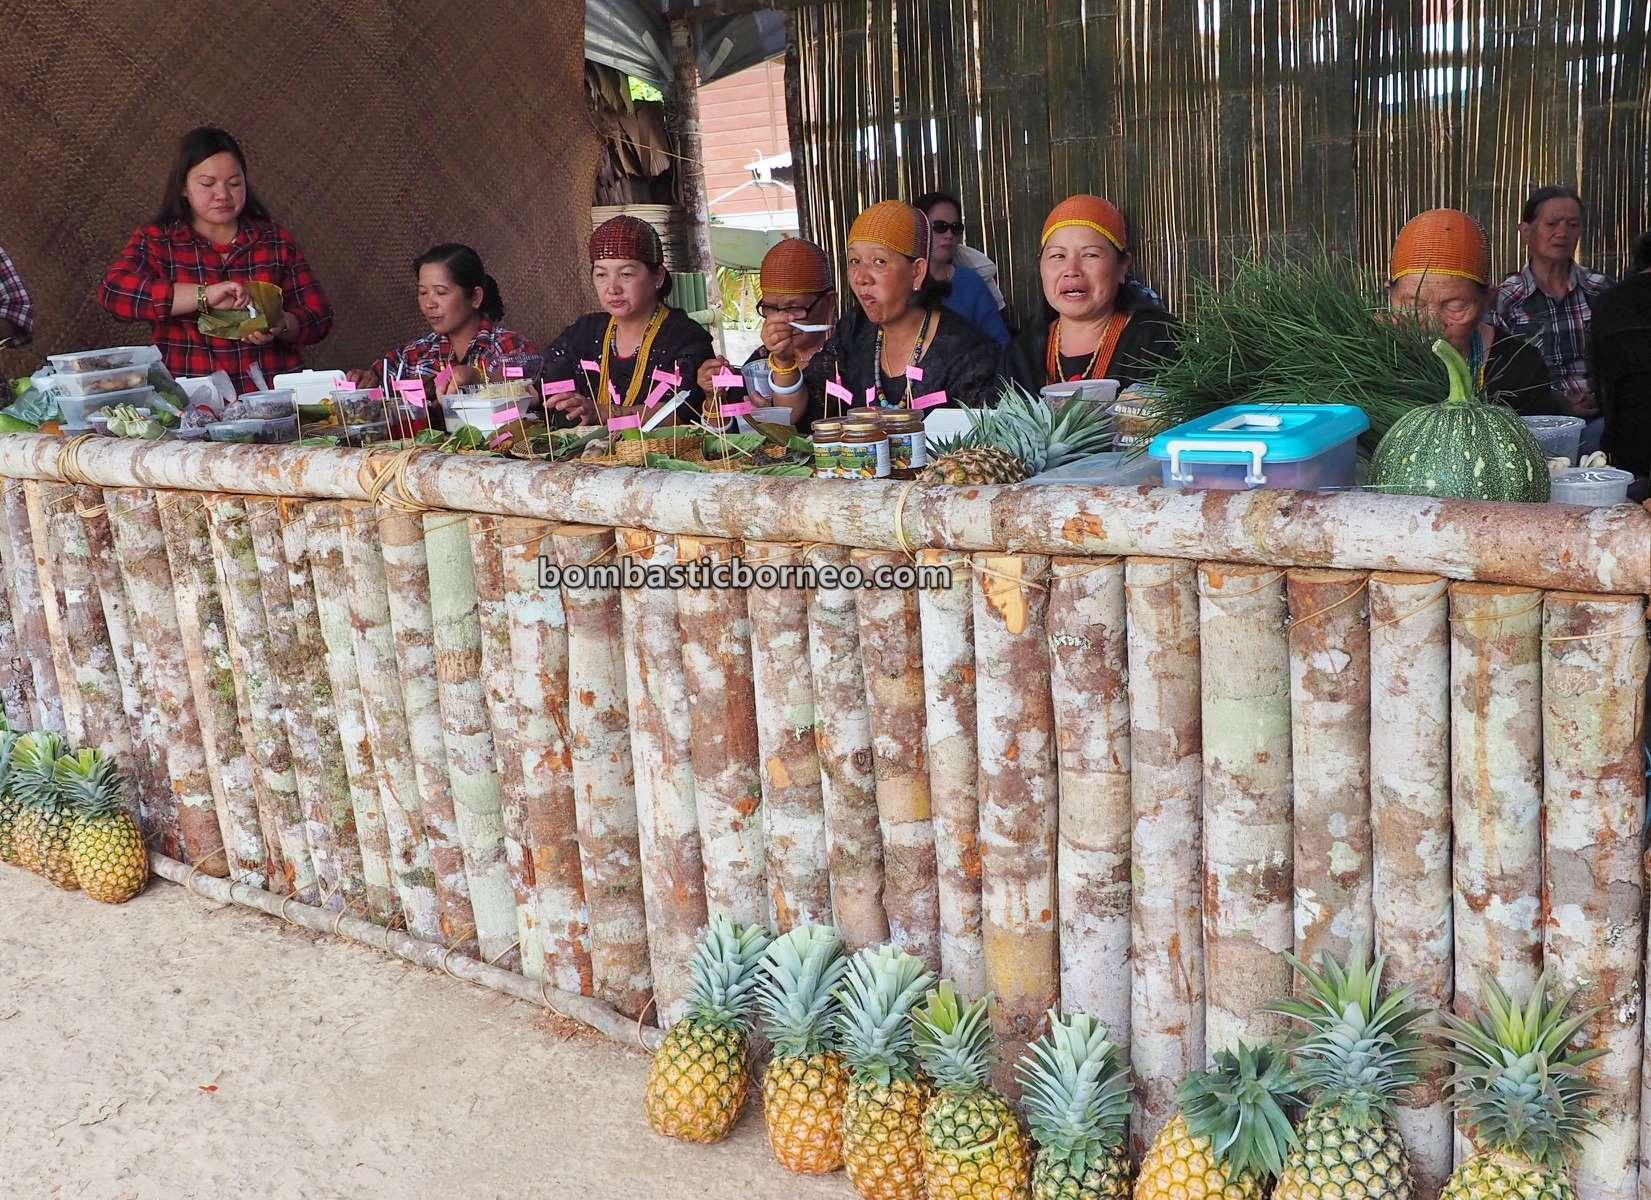 Bario Food Cultural Festival, crafts, exotic culinary, authentic, indigenous, dayak, native, tribe, orang ulu, Malaysia, travel, Borneo, 砂拉越美食旅游景点, 巴里奥乌鲁人部落, 婆罗洲加拉毕族传统文化,